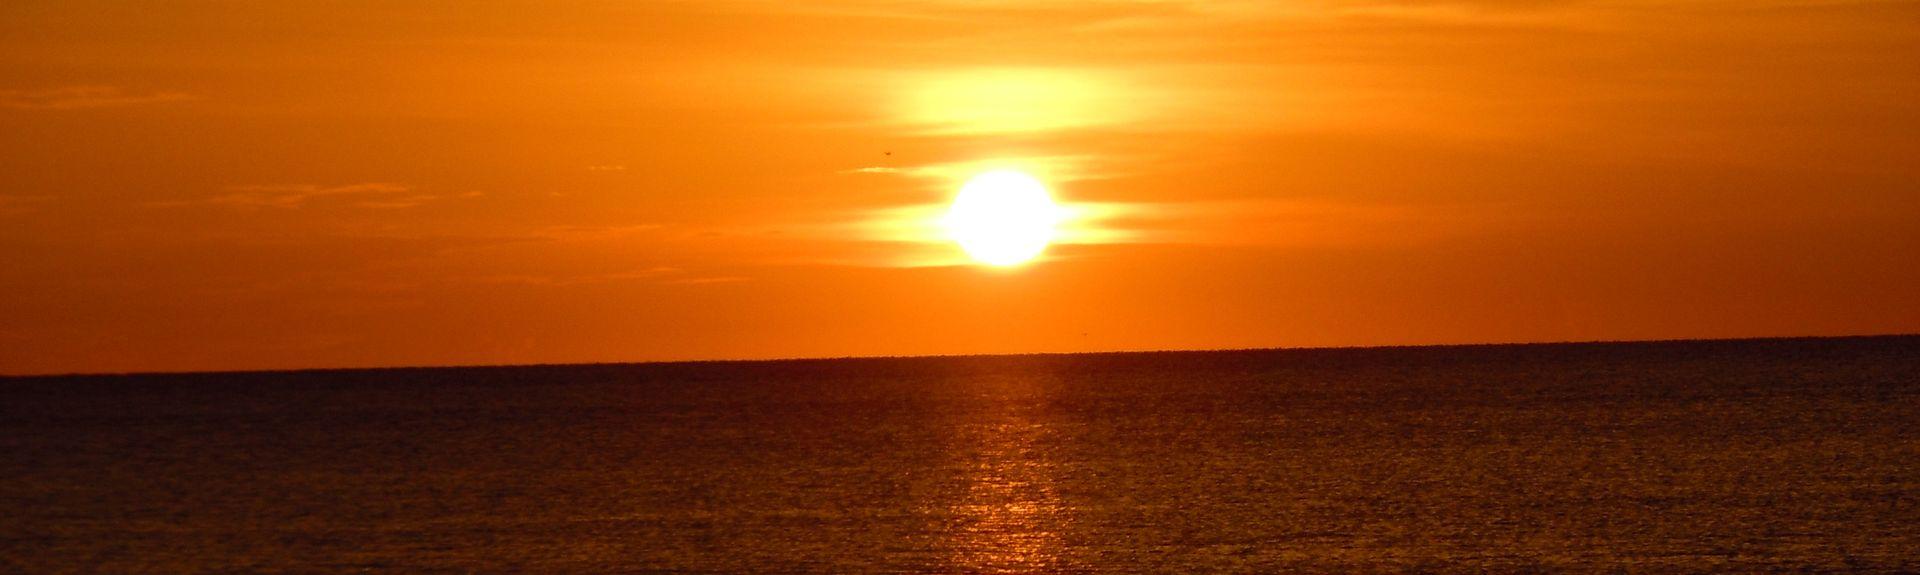 Apollo, Marco Island, FL, USA